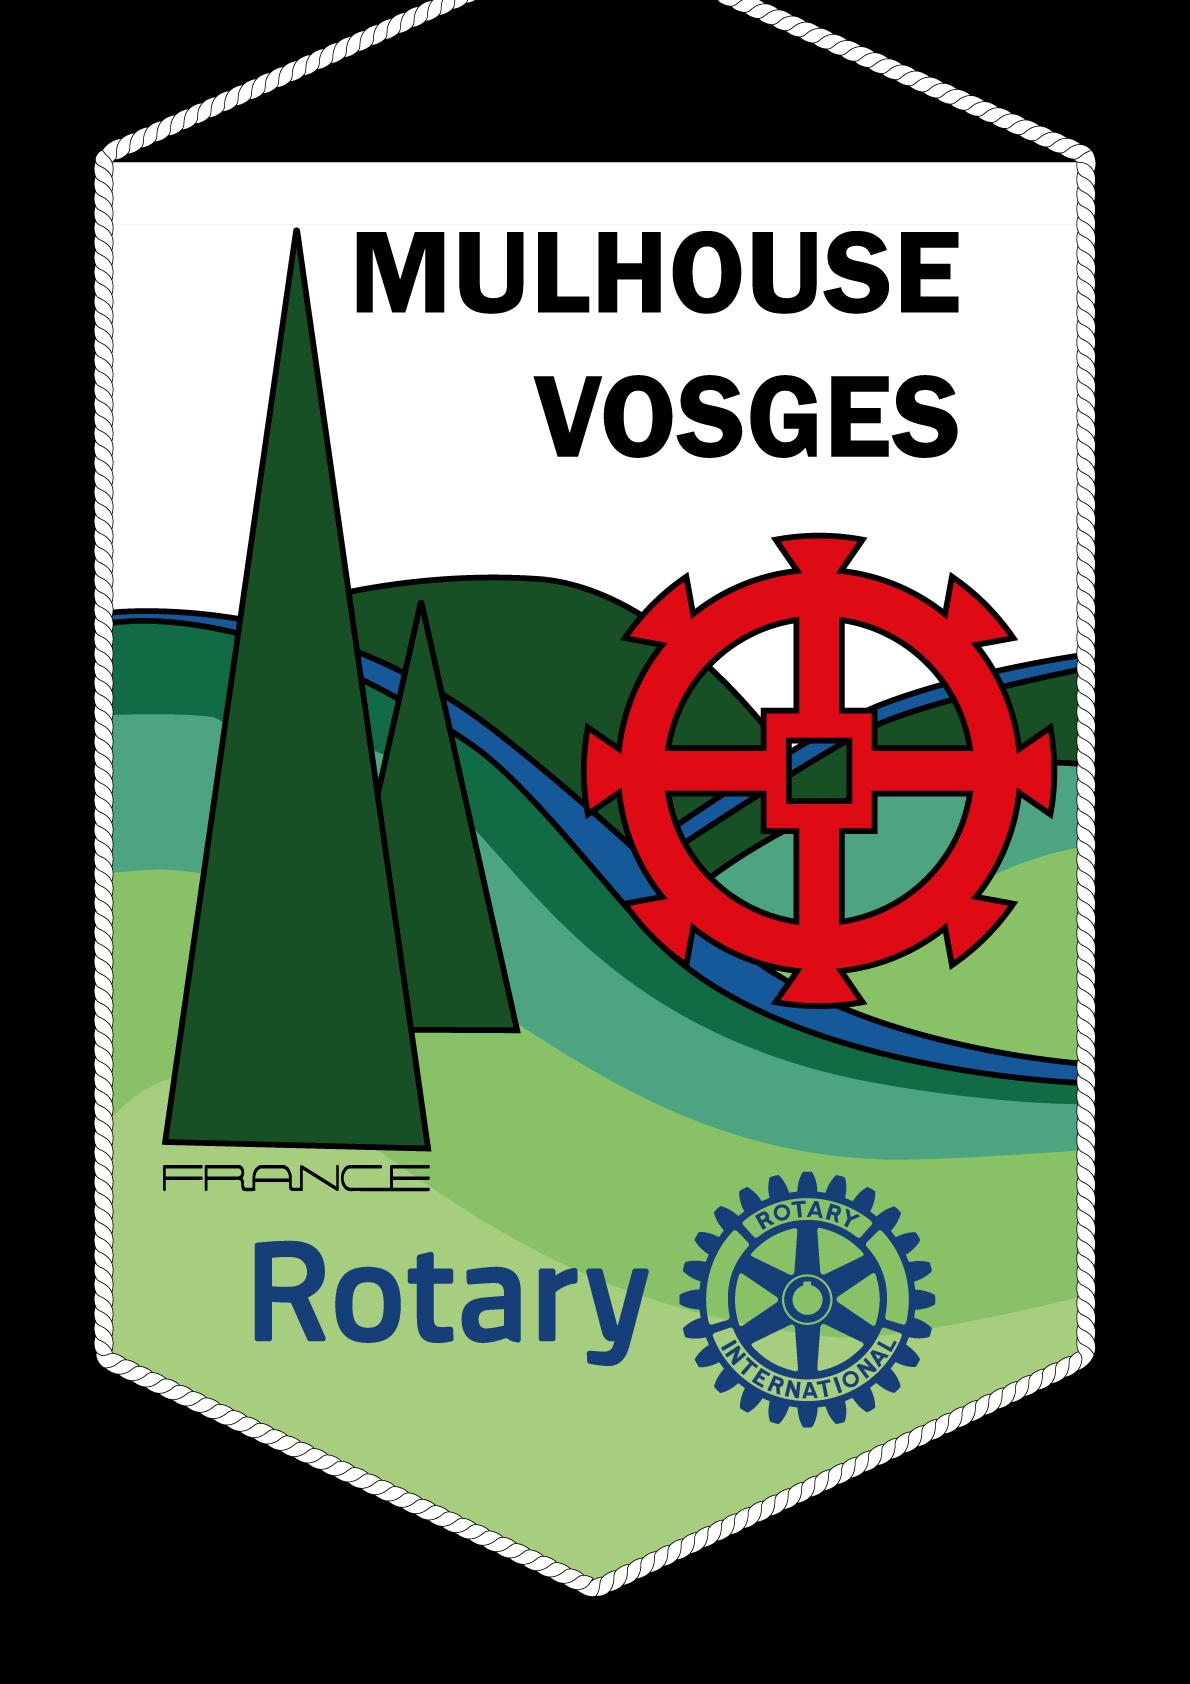 FANION ROTARY CLUB MULHOUSE VOSGES